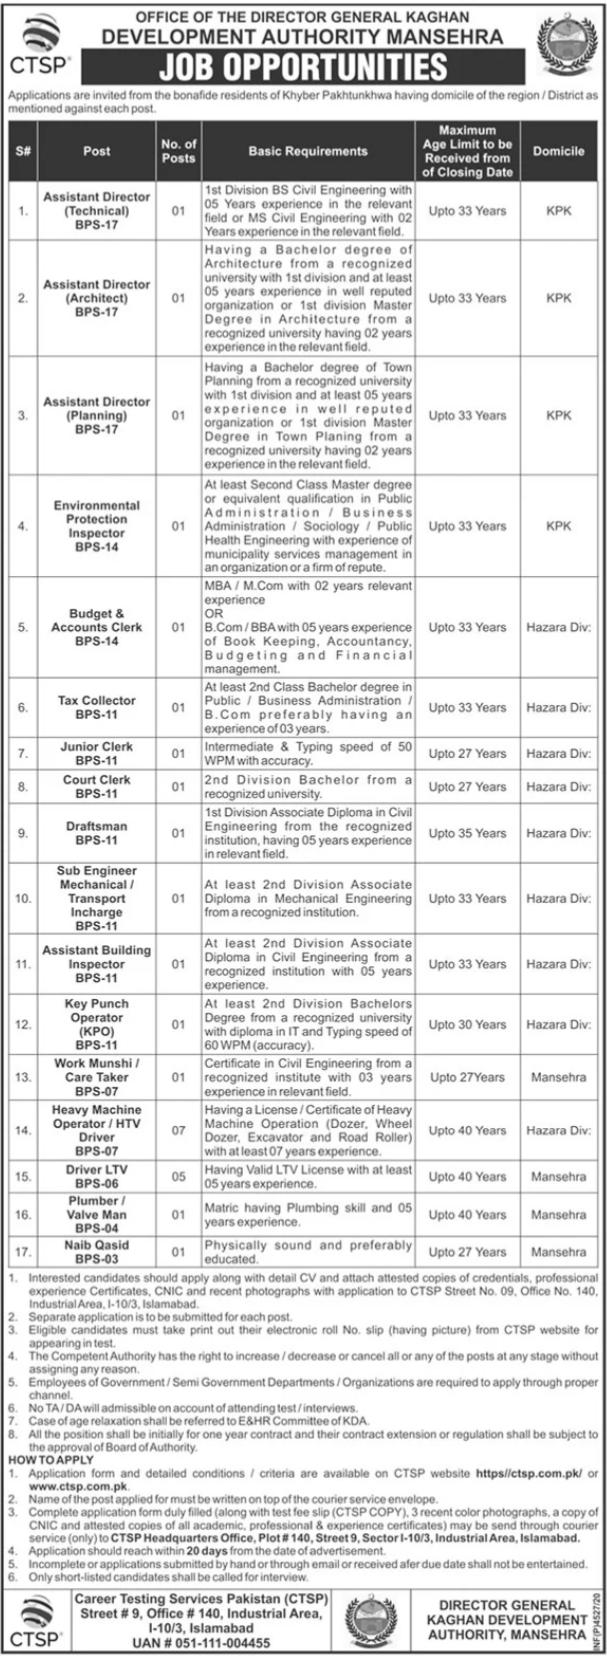 Development Authority Manshera Jobs 2020 via CTSP